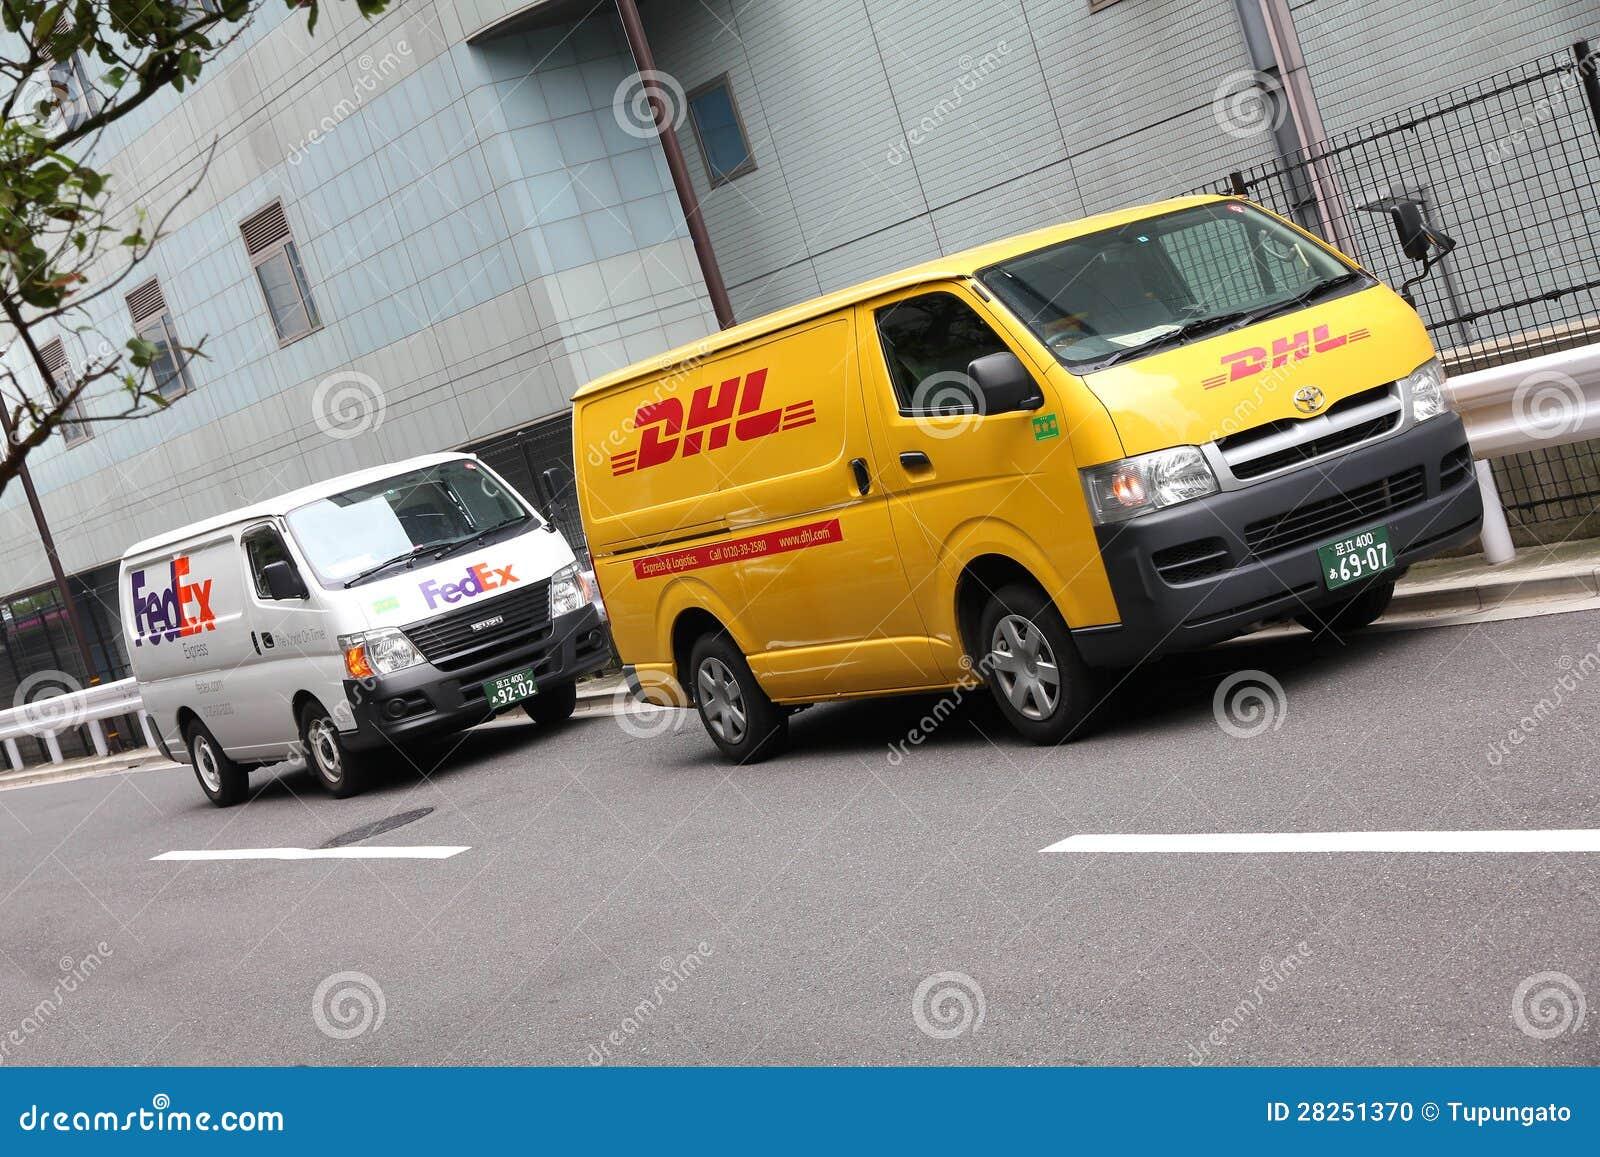 Fedex Vs Dhl Editorial Image Image 28251370